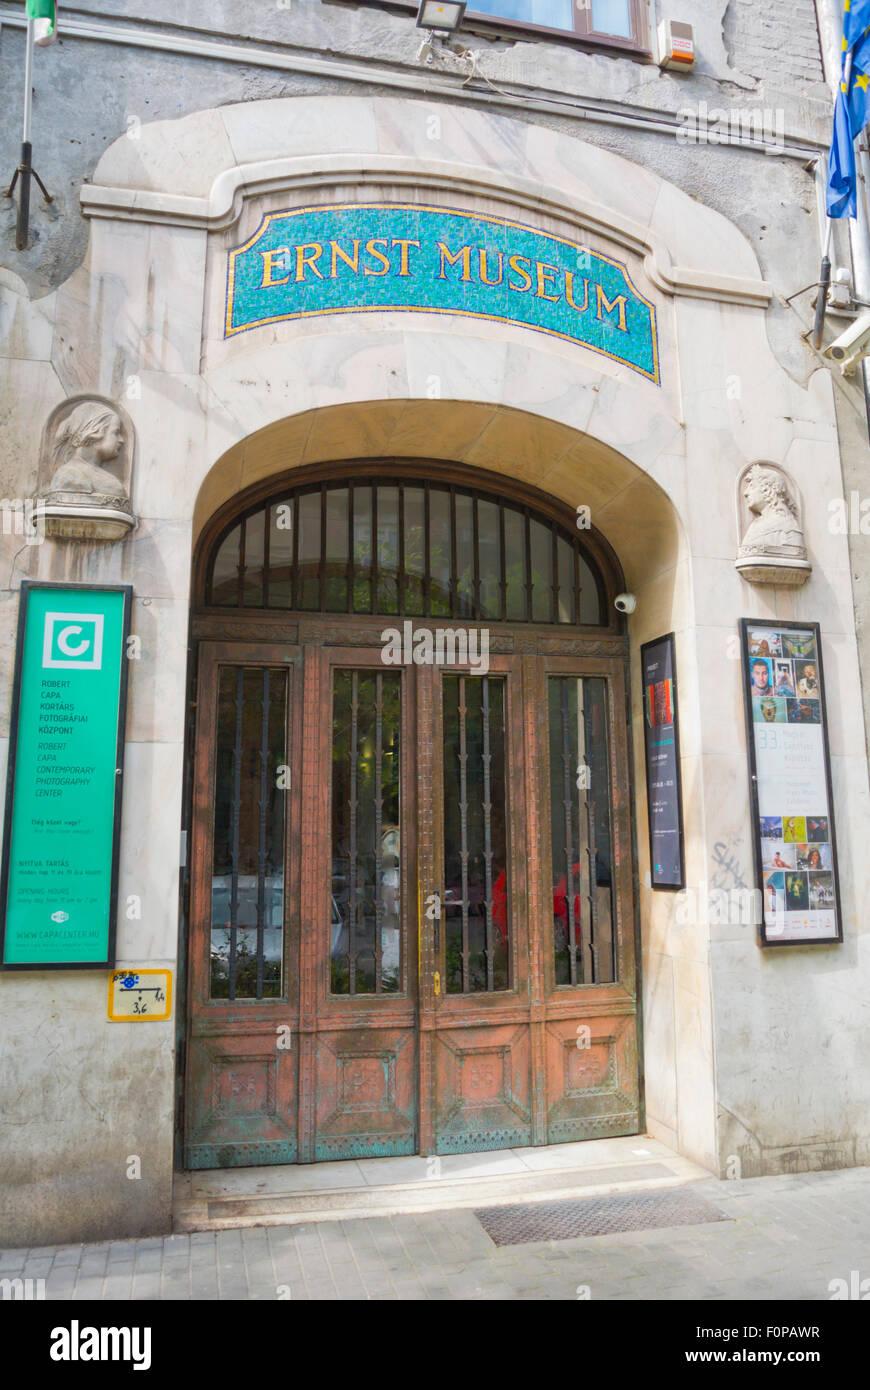 Ernst Museum, Robert Capa center, museum, Pest, Budapest, Hungary, Europe - Stock Image